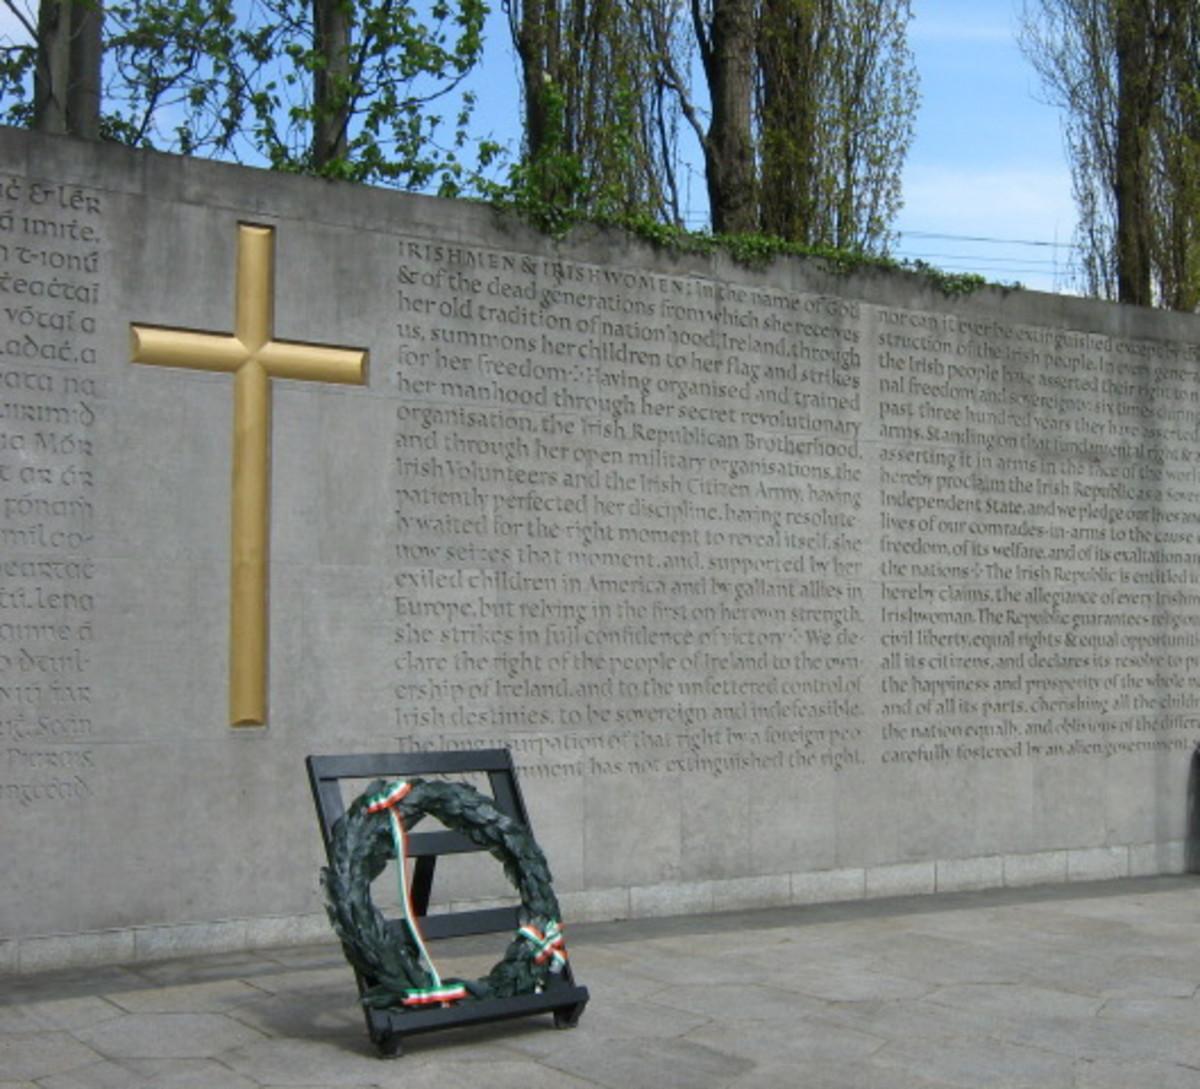 Arbour Hill Memorial